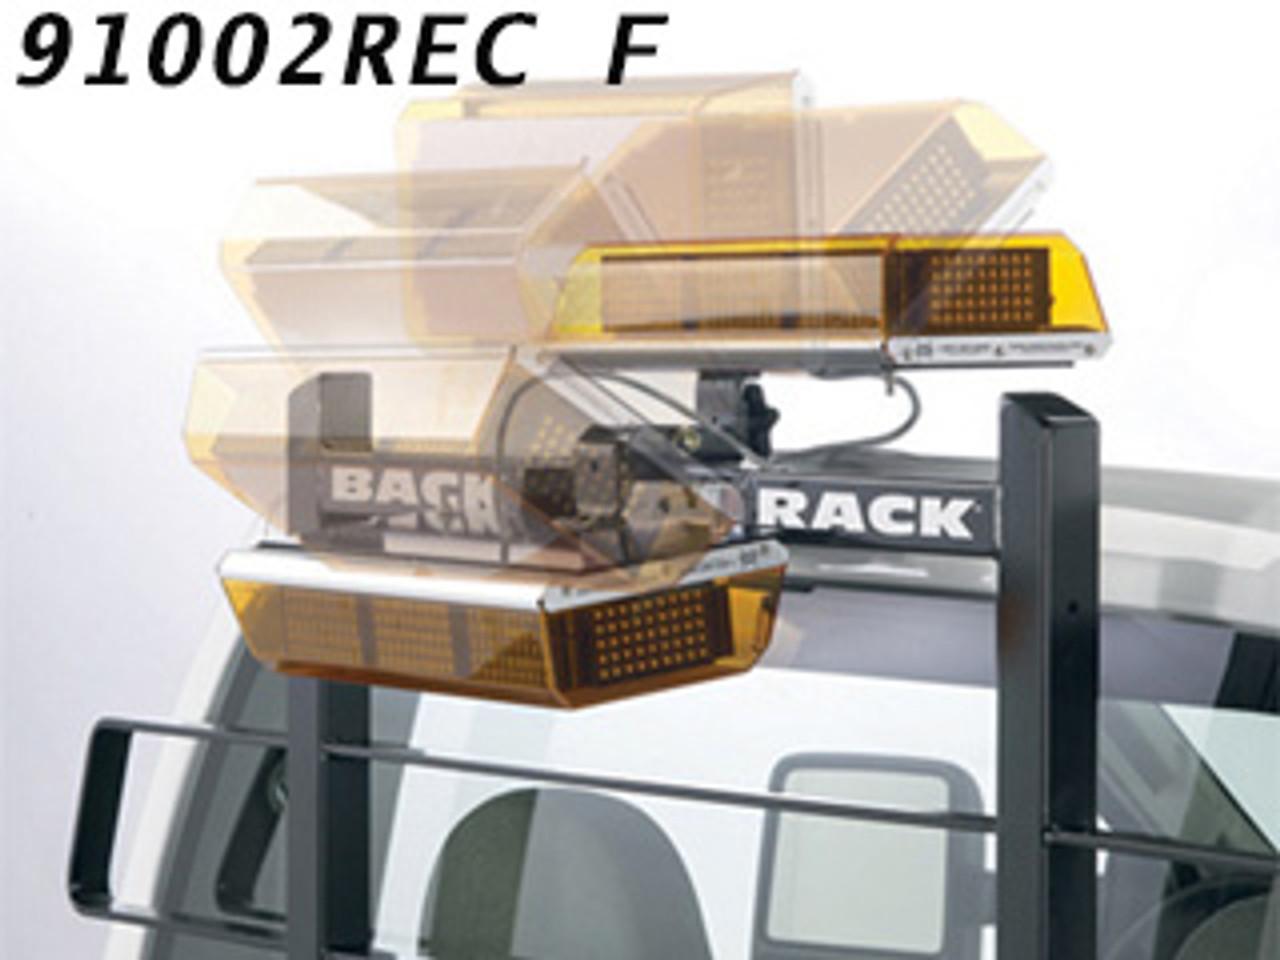 Backrack 91002REC 16 X 7 Center Mount Utility Light Bracket